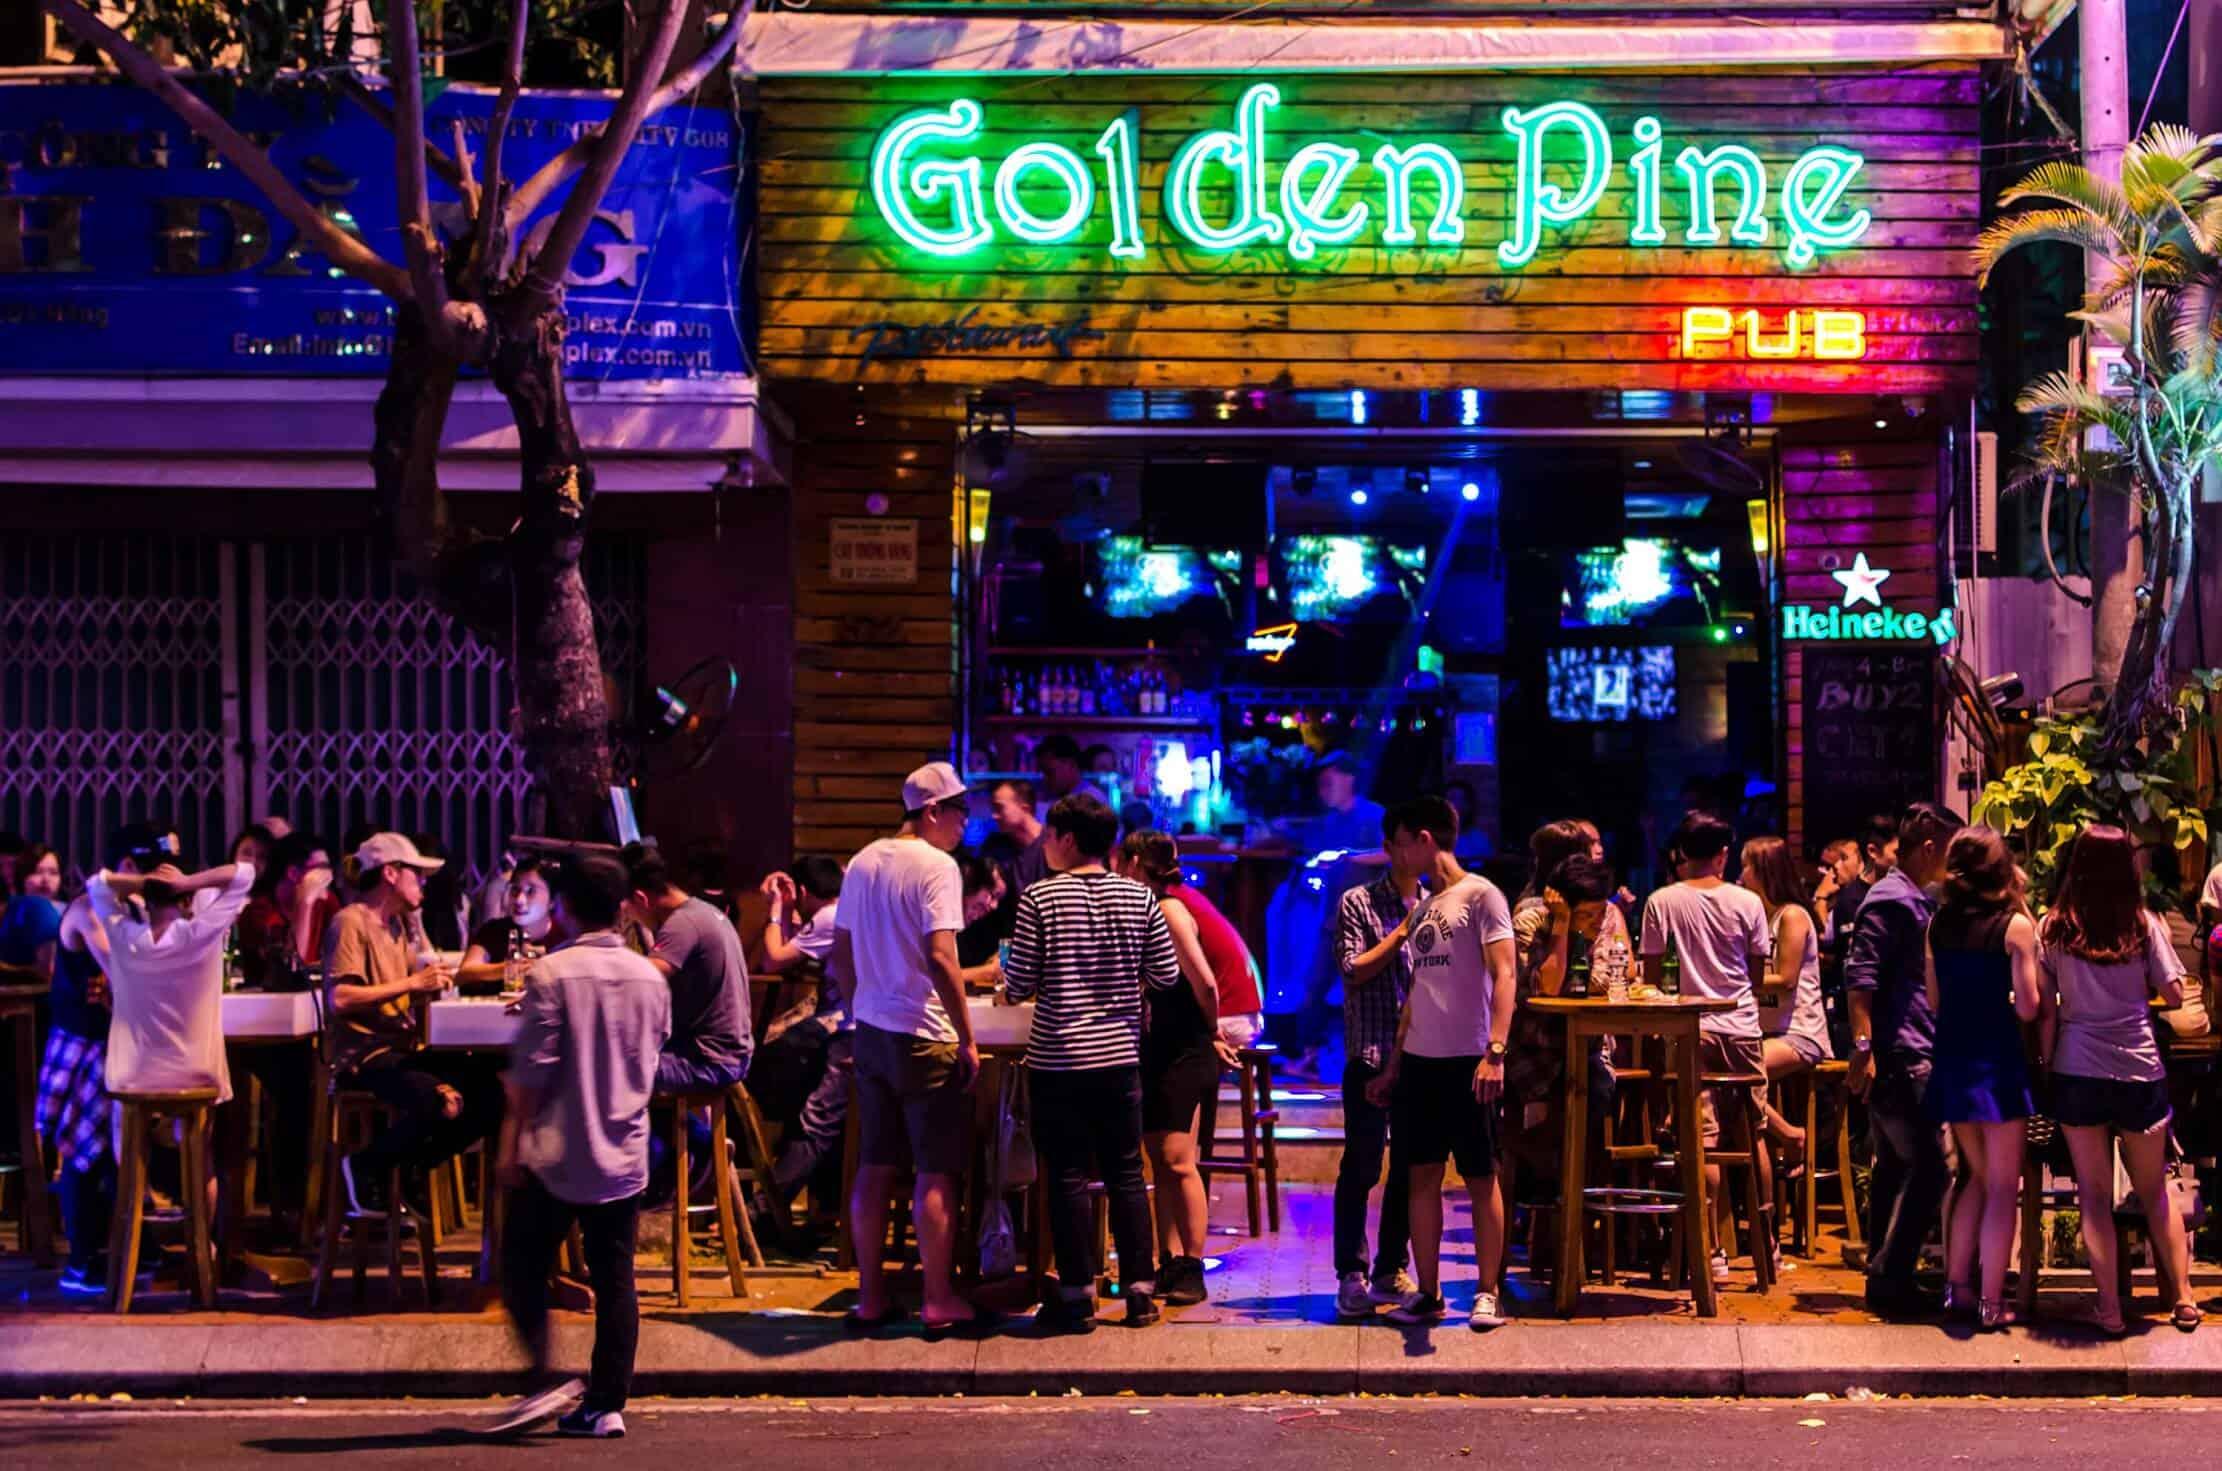 Golden Pine Pub Da Nang - best bars in Danang